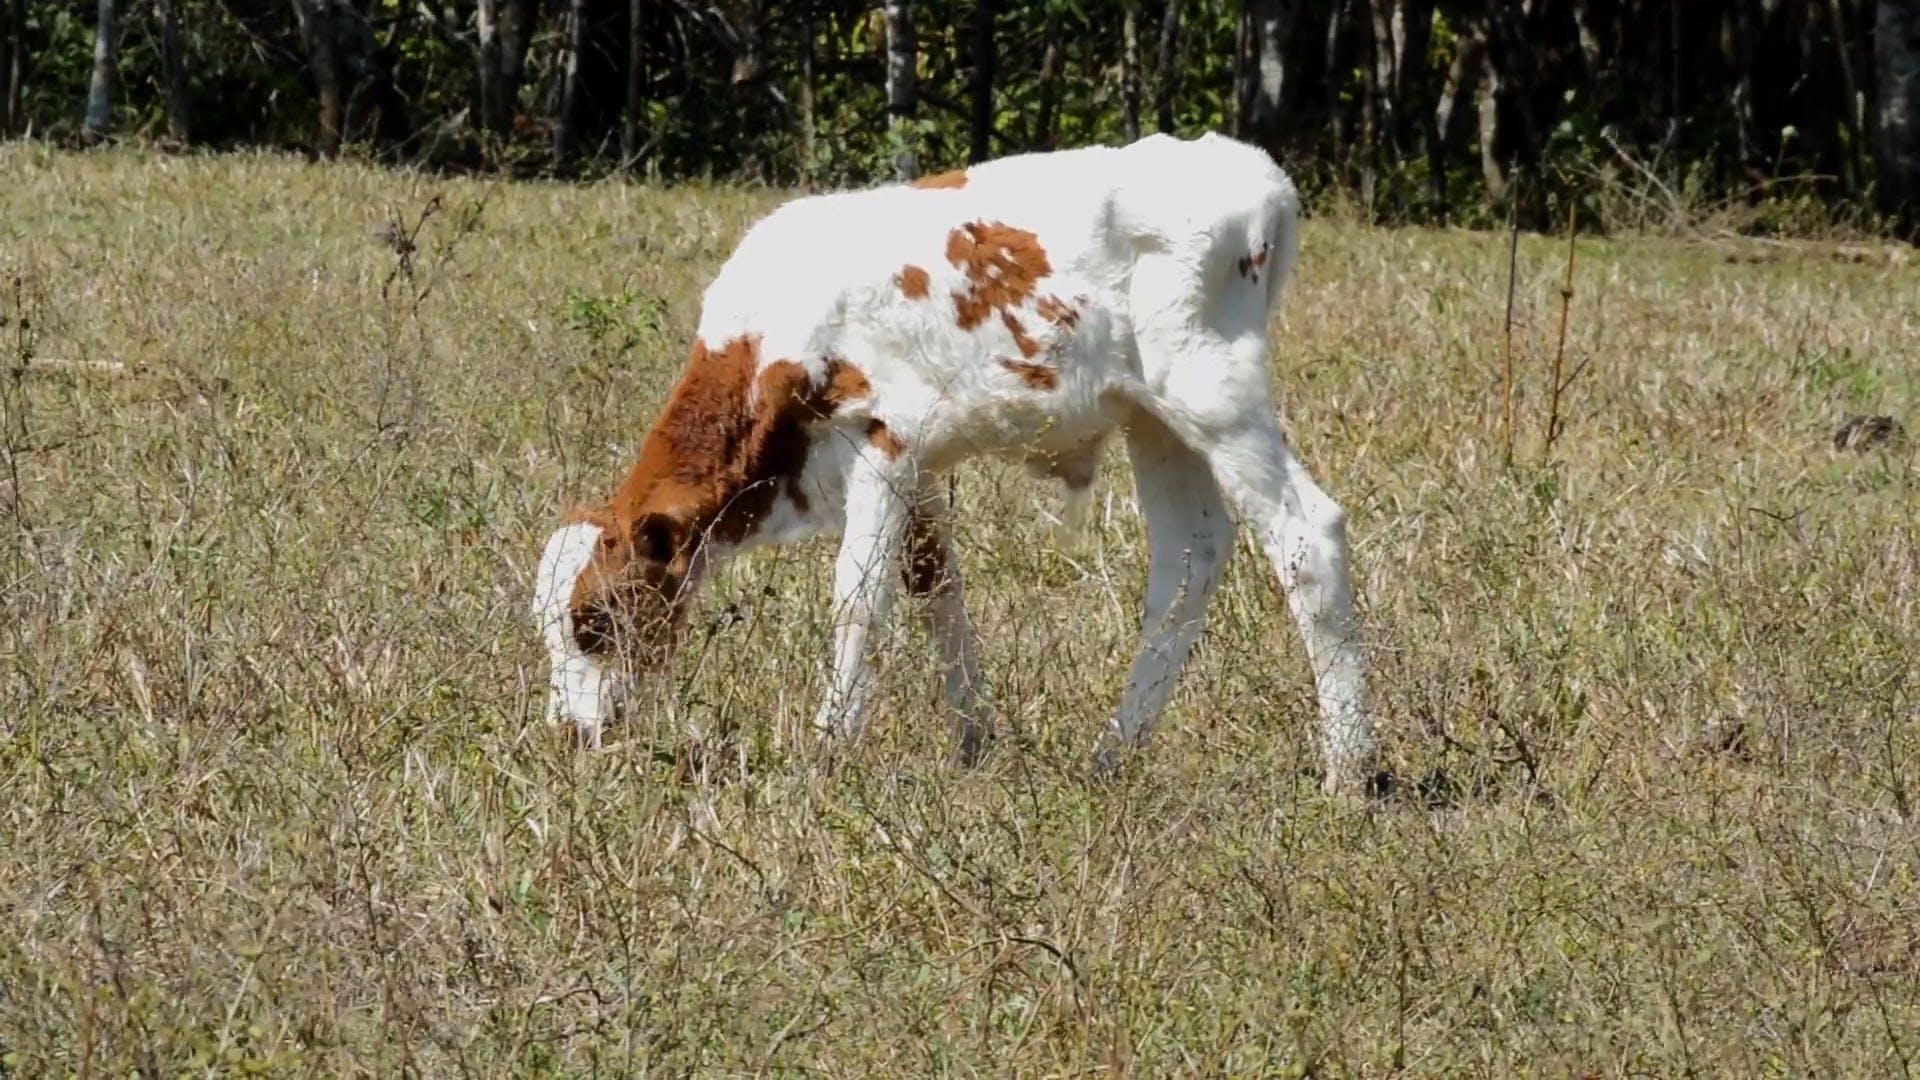 A Calf Feeding On Grass